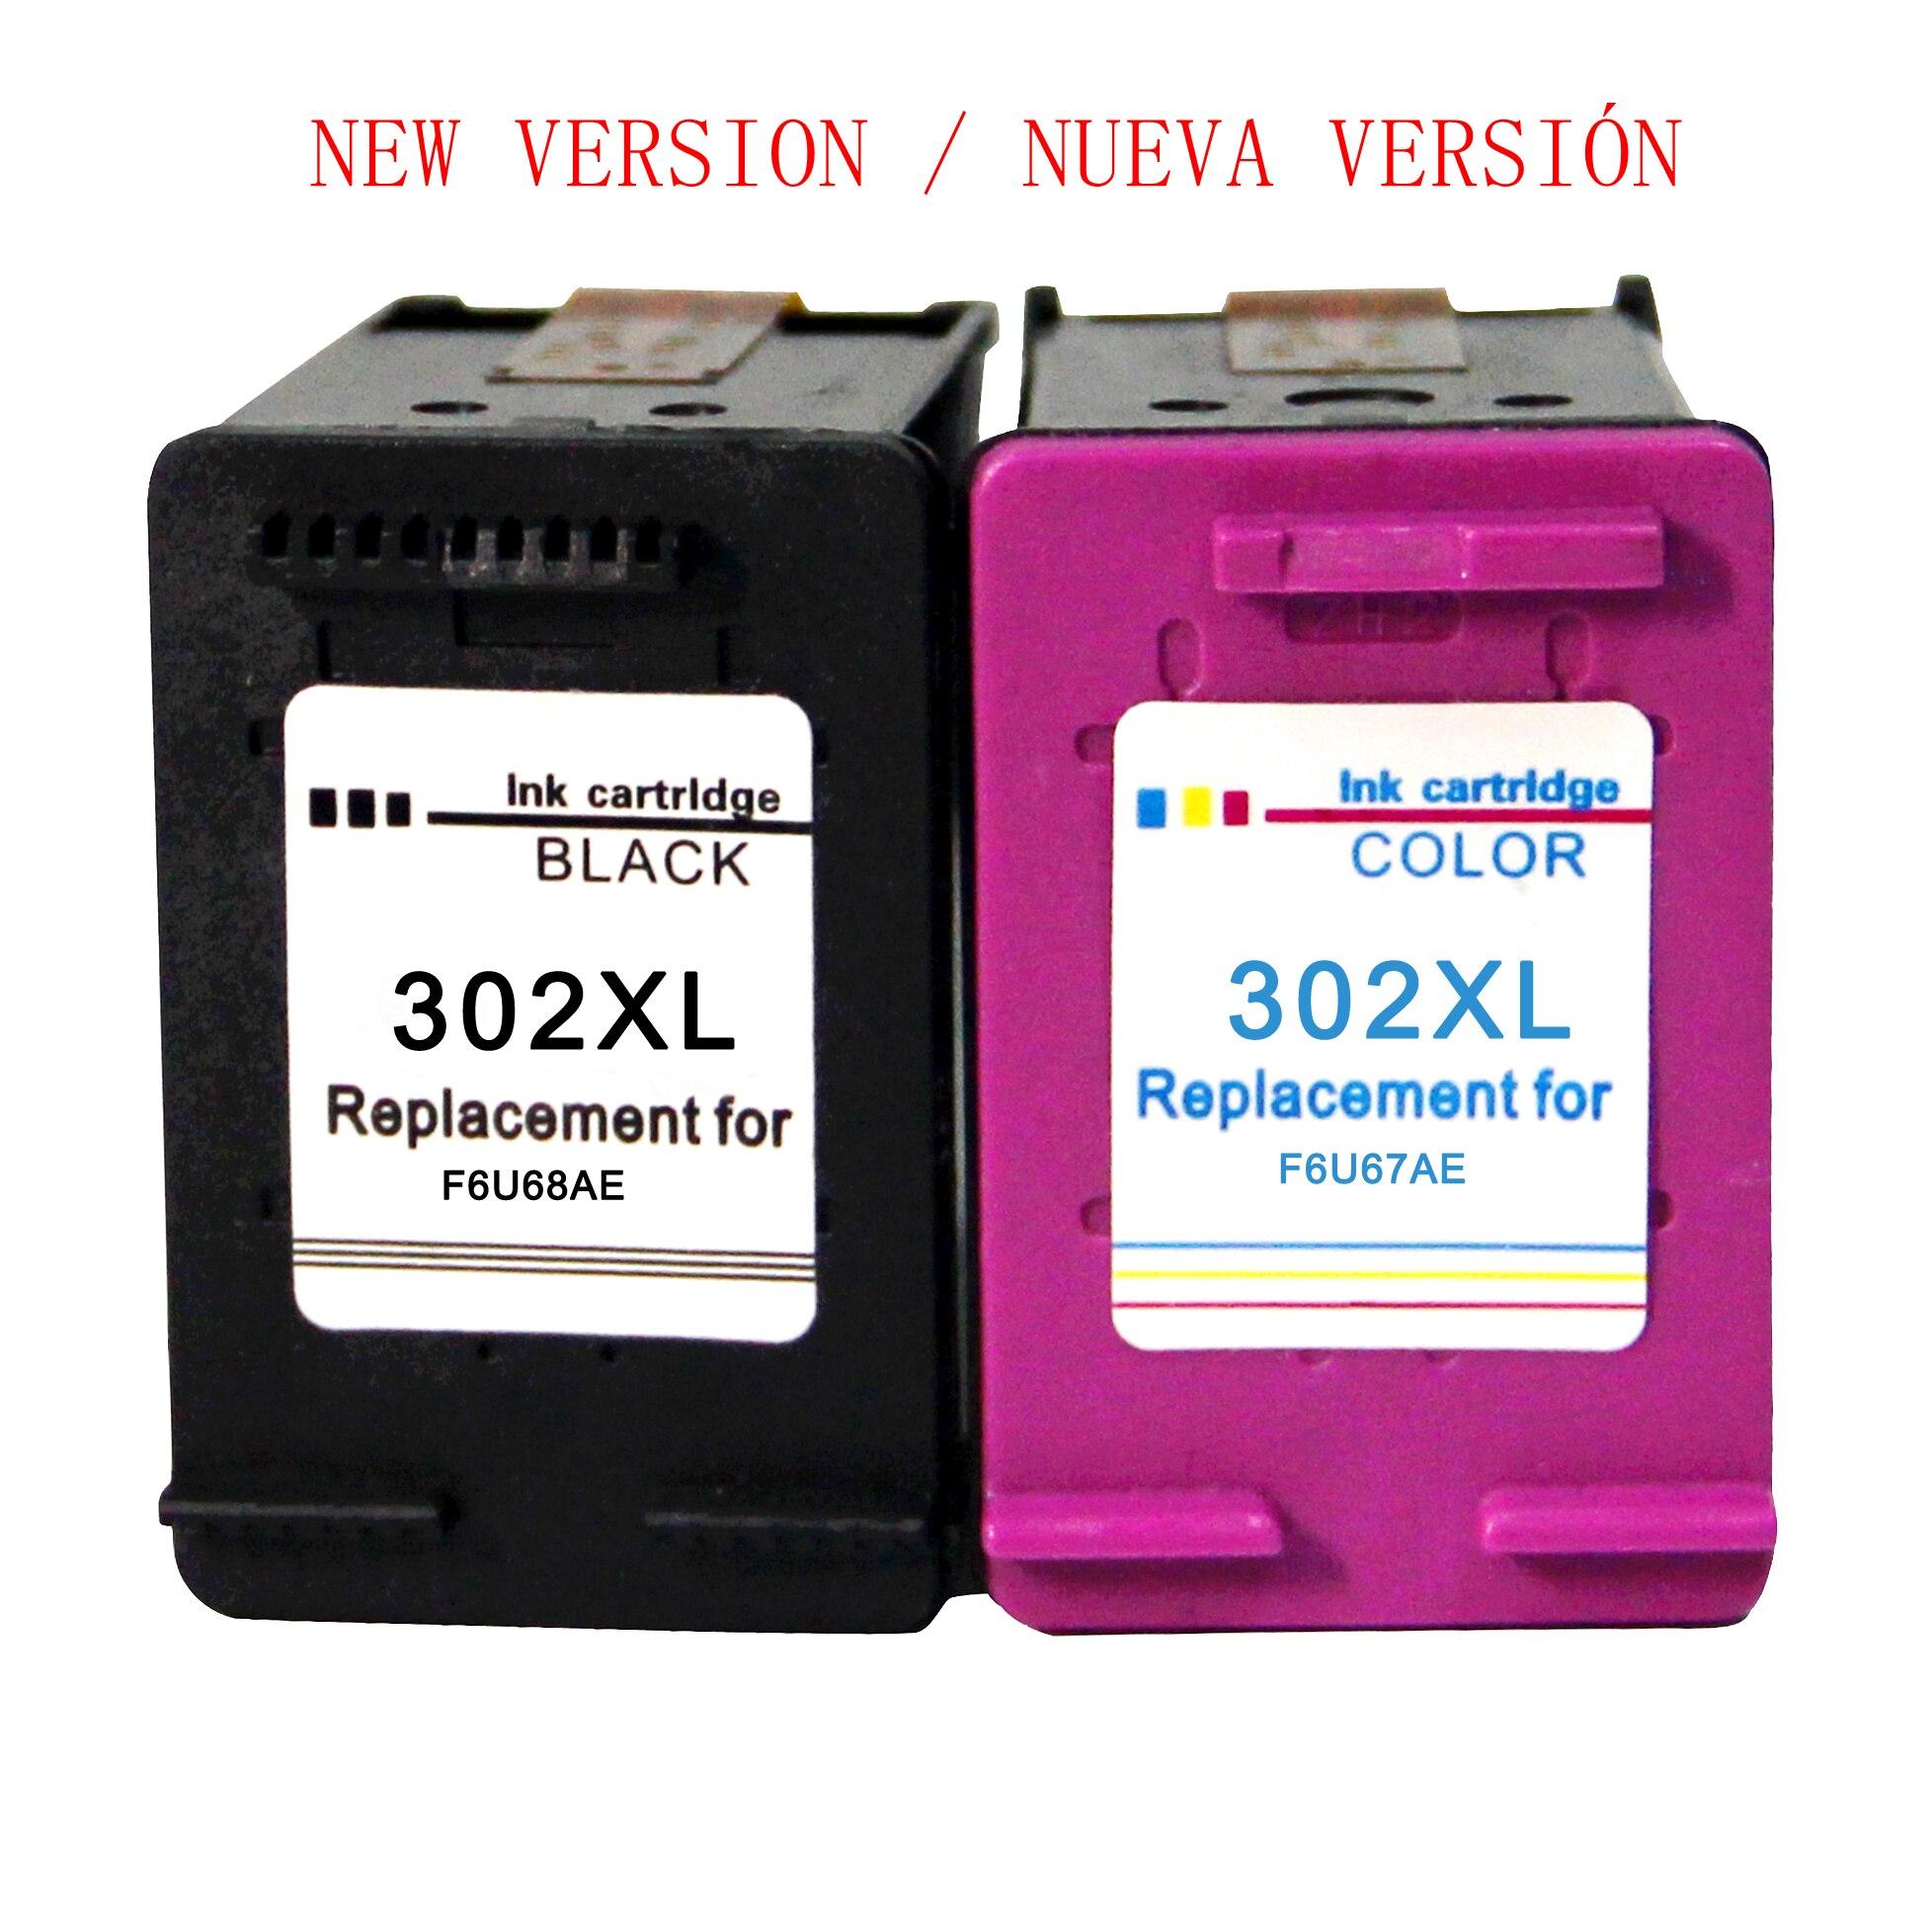 302XL Cartuchos de tinta compatíveis para HP 302 para HP OfficeJet 5220 5222 5230 5232 3831 3833 Envy 4520 4524 deskJet 3639